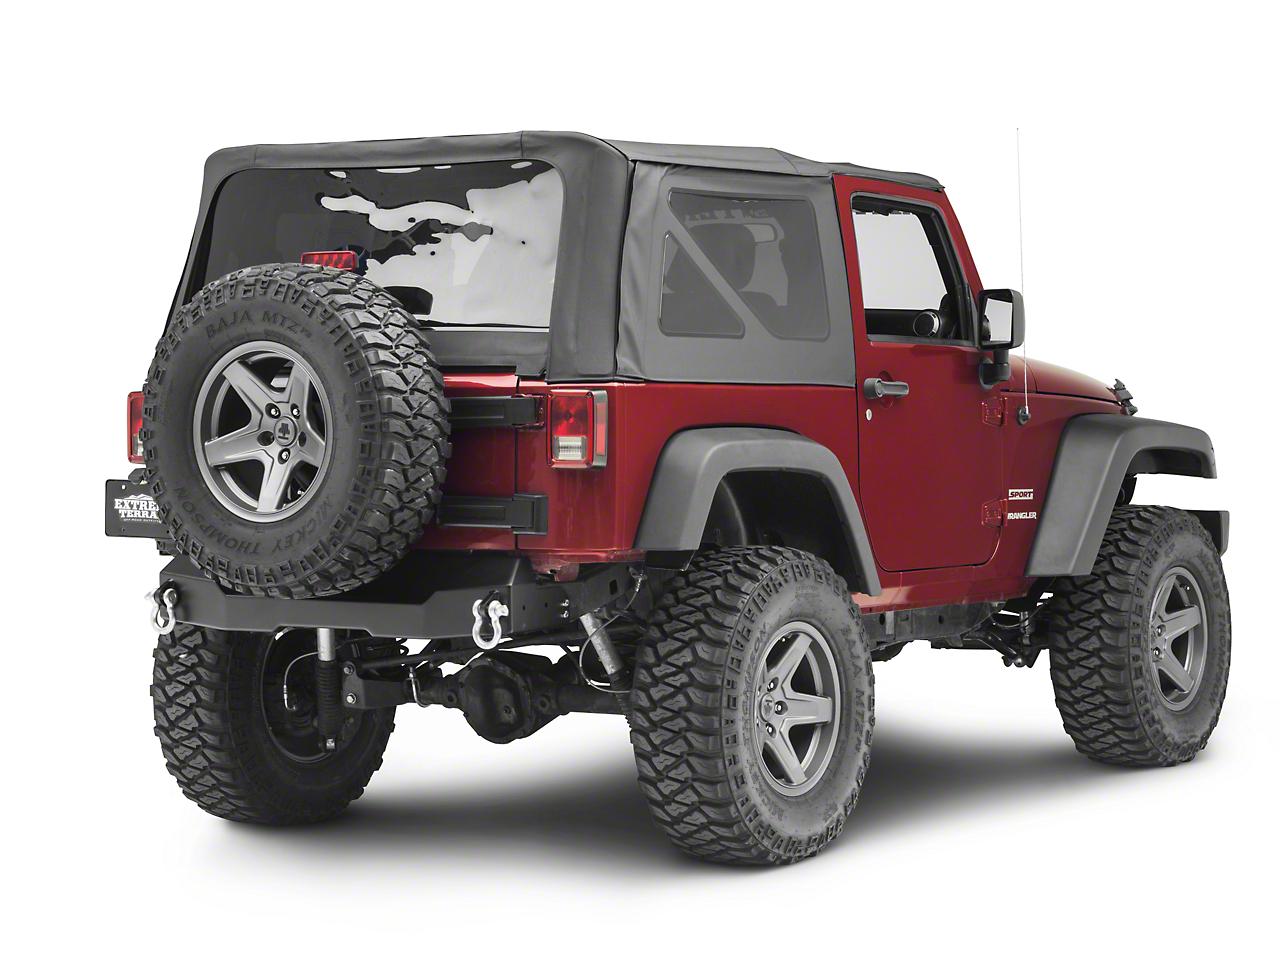 Hyline Offroad Canyon Stubby Rear Bumper (07-18 Jeep Wrangler JK)